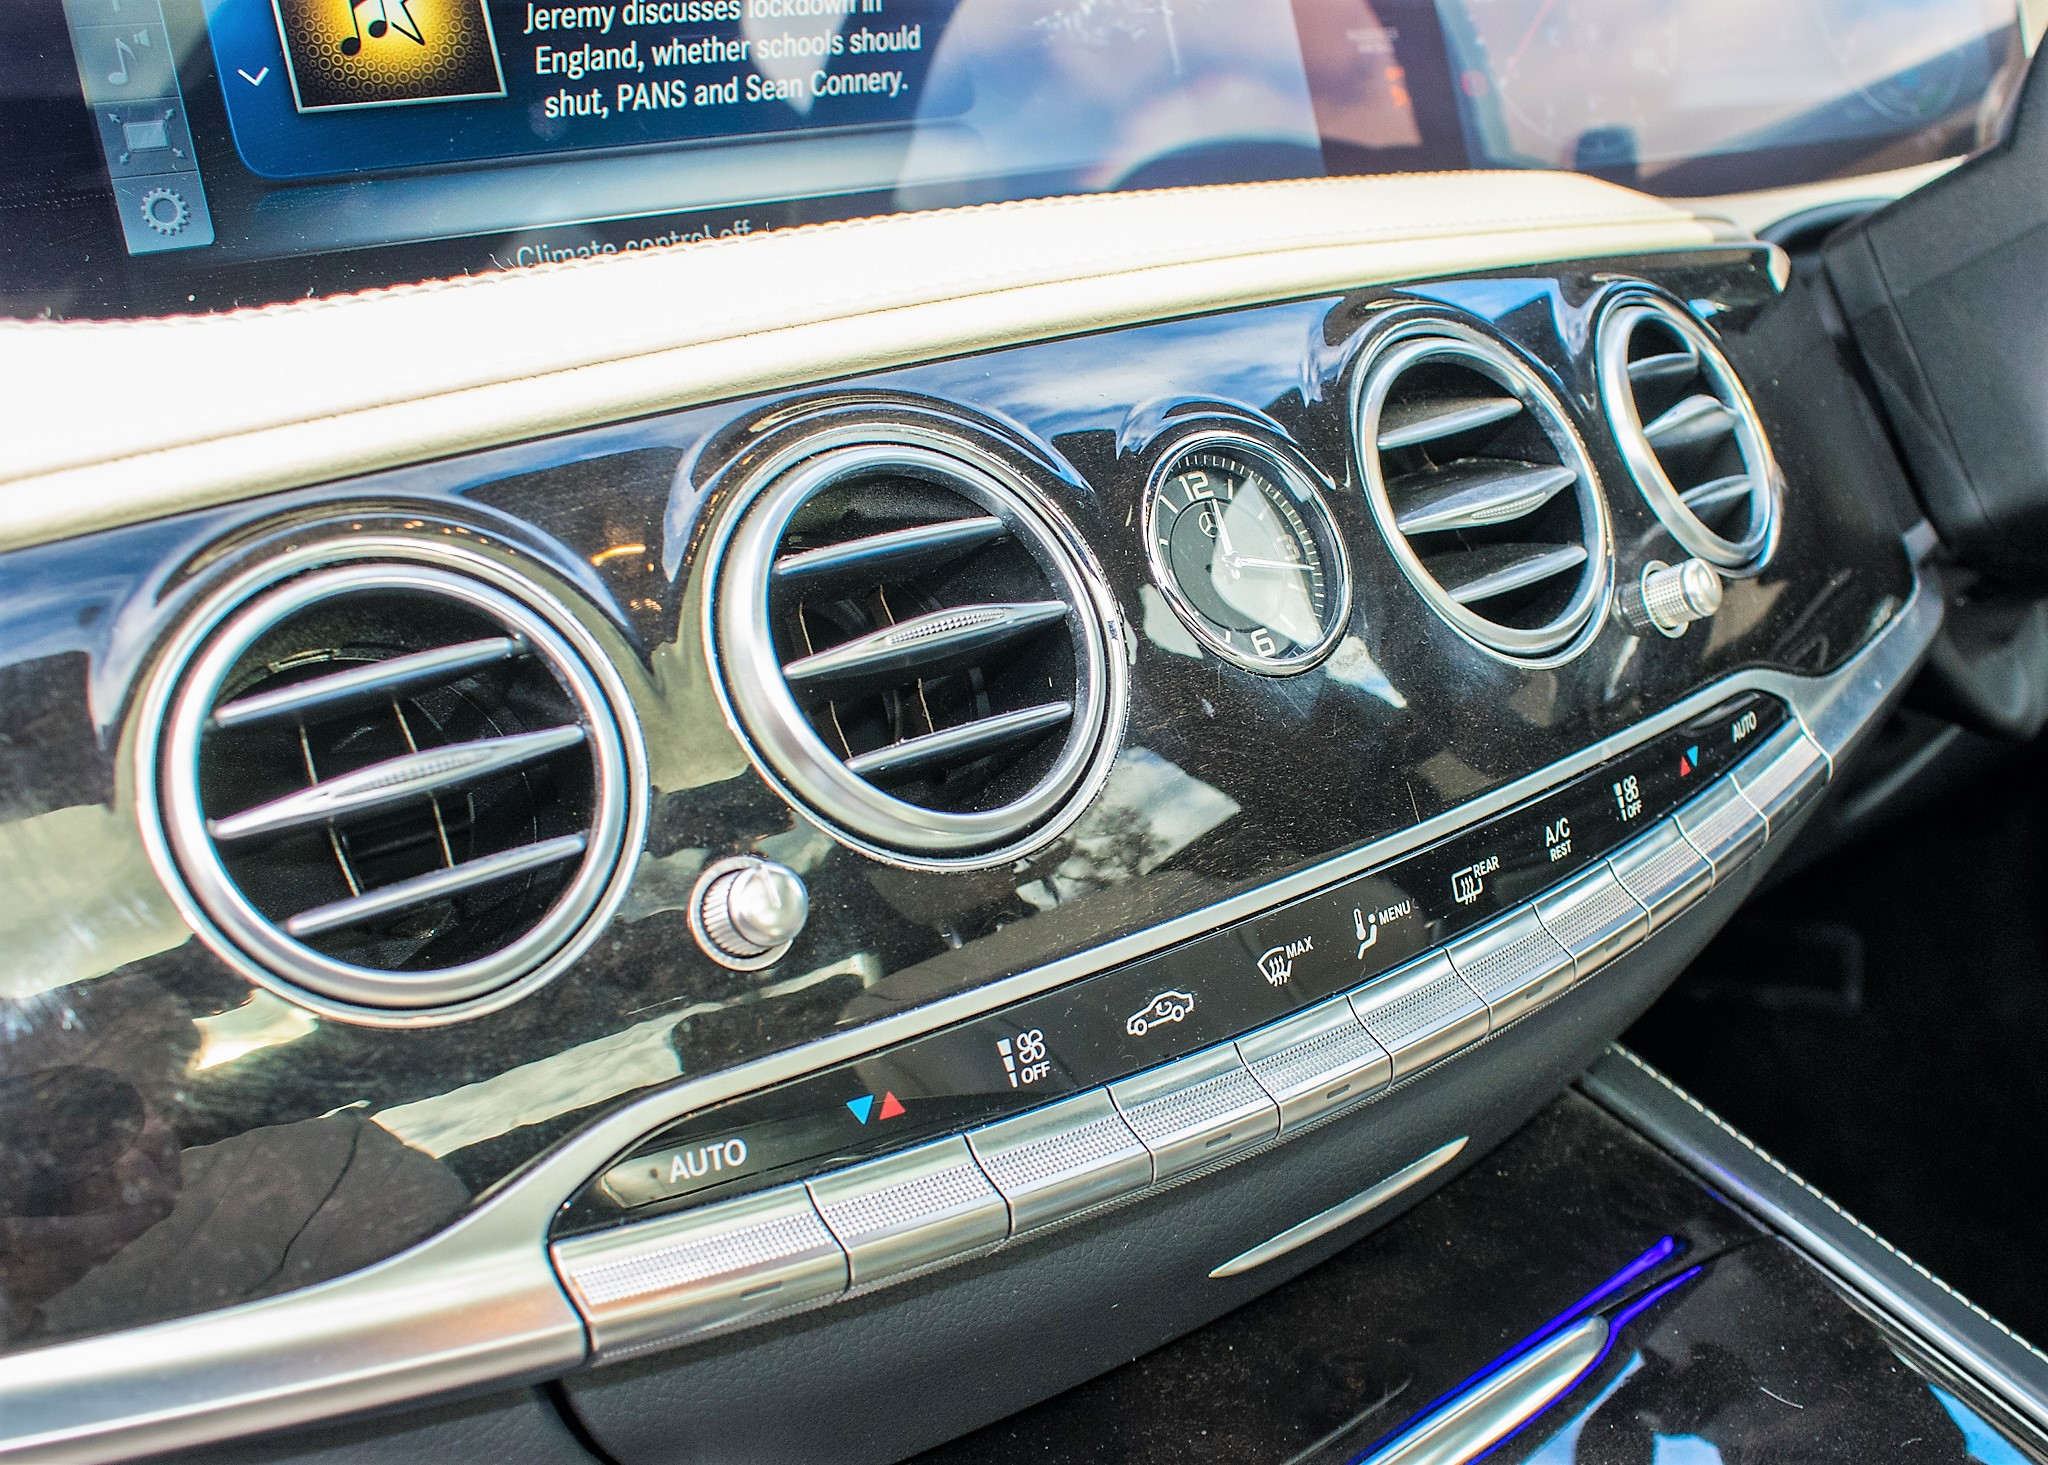 Mercedes Benz S450 L AMG Line Executive auto petrol 4 door saloon car Registration Number: FX68 - Image 30 of 30